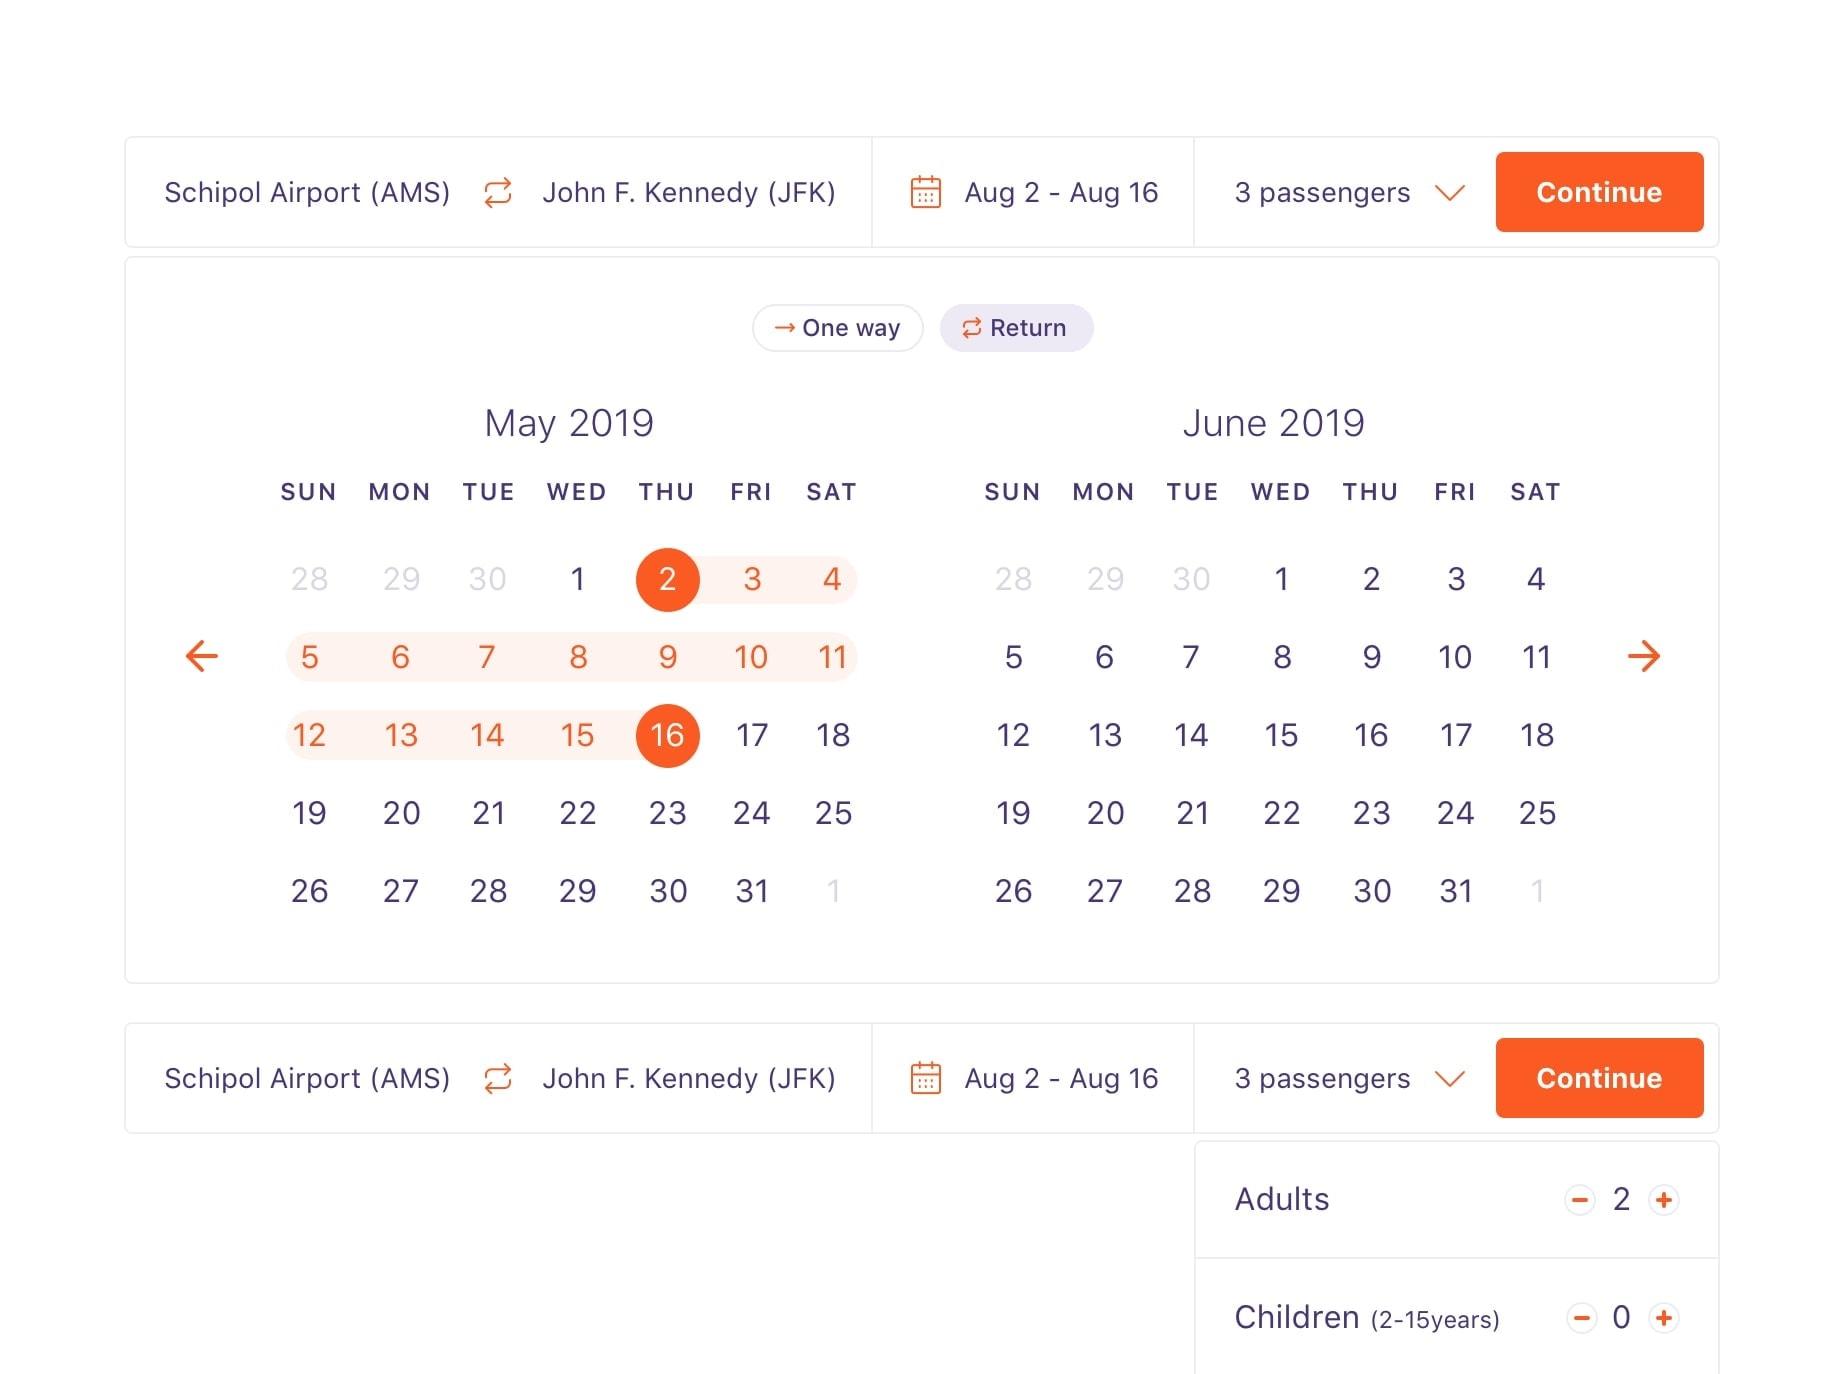 Airline Datepicker on Desktop from UIGarage